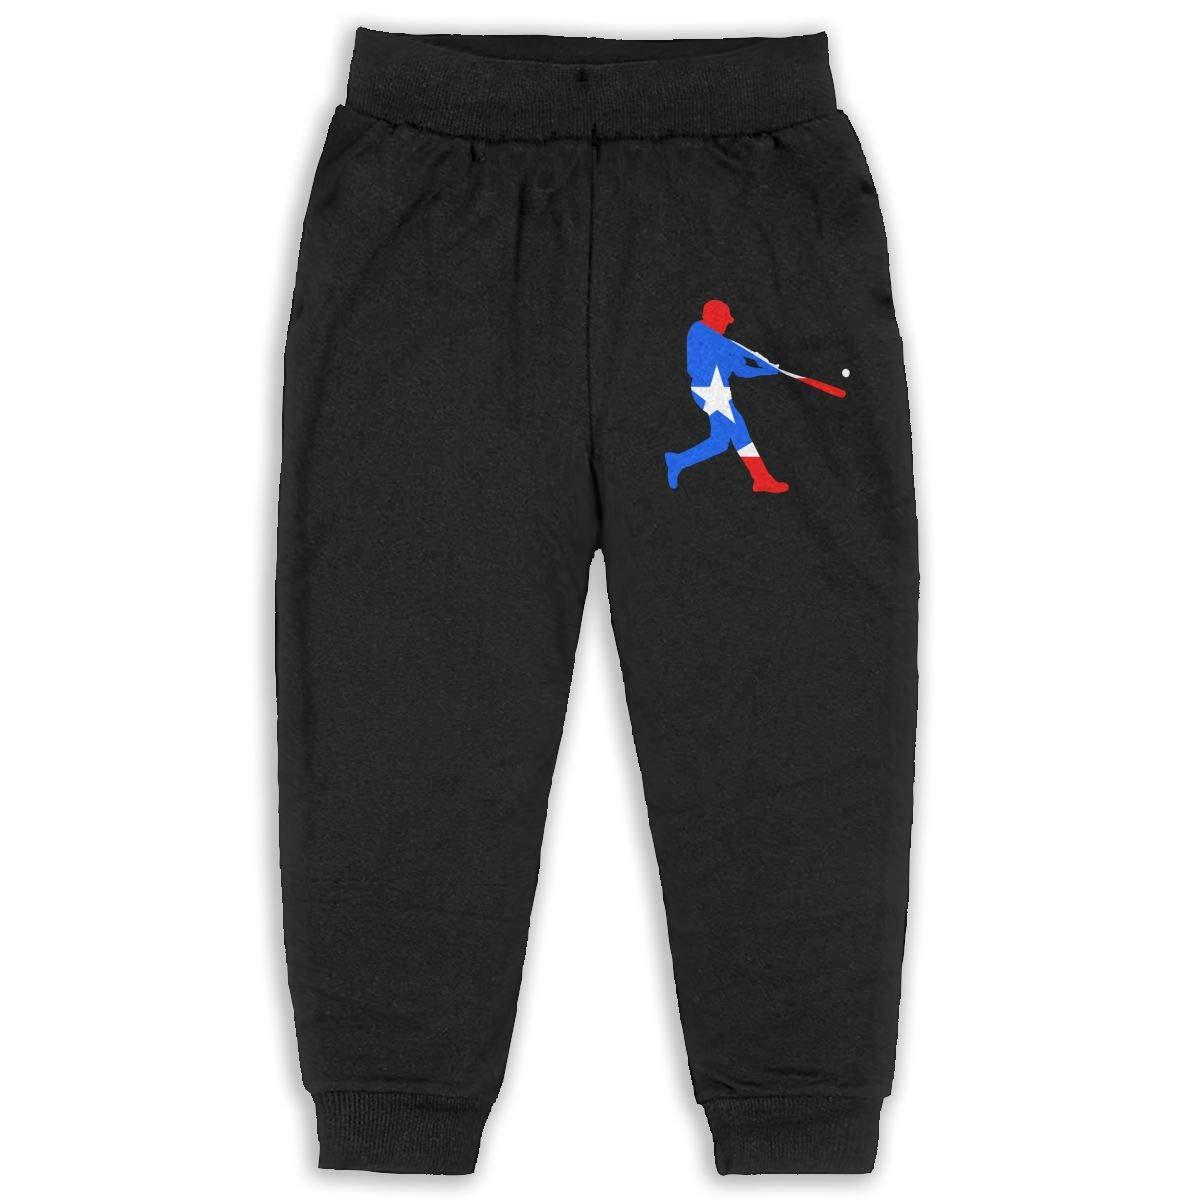 6T Kids Joggers Puerto Rico Baseball Fashion Sweatpants 2T